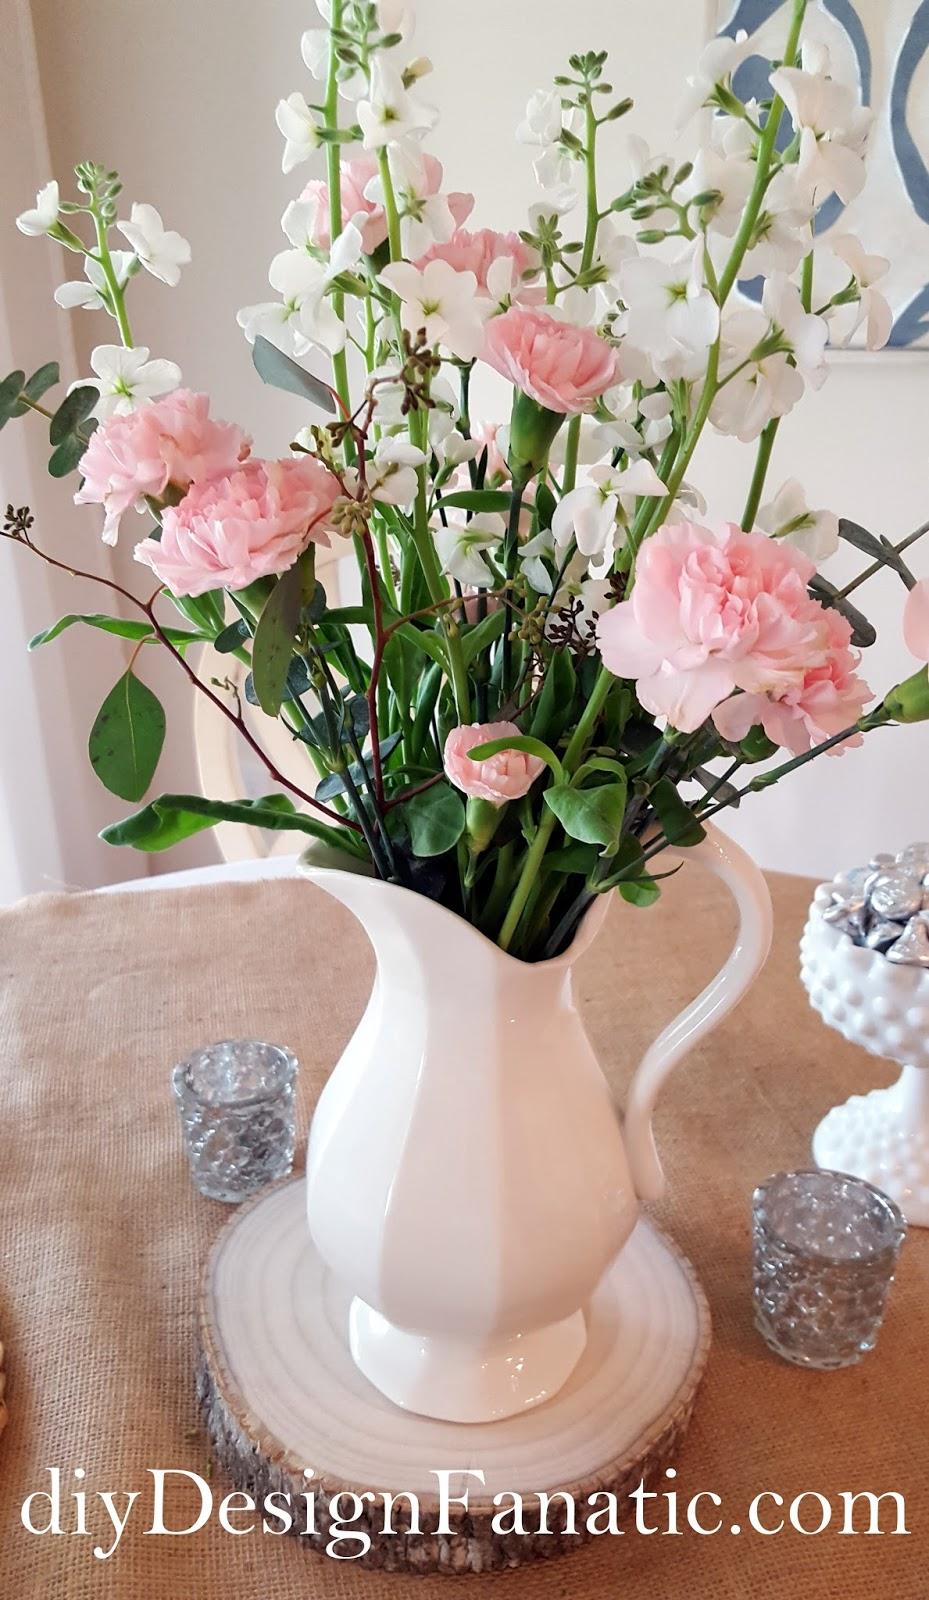 flowers tablescape cottage style farmhouse style diydesignfanaticcom